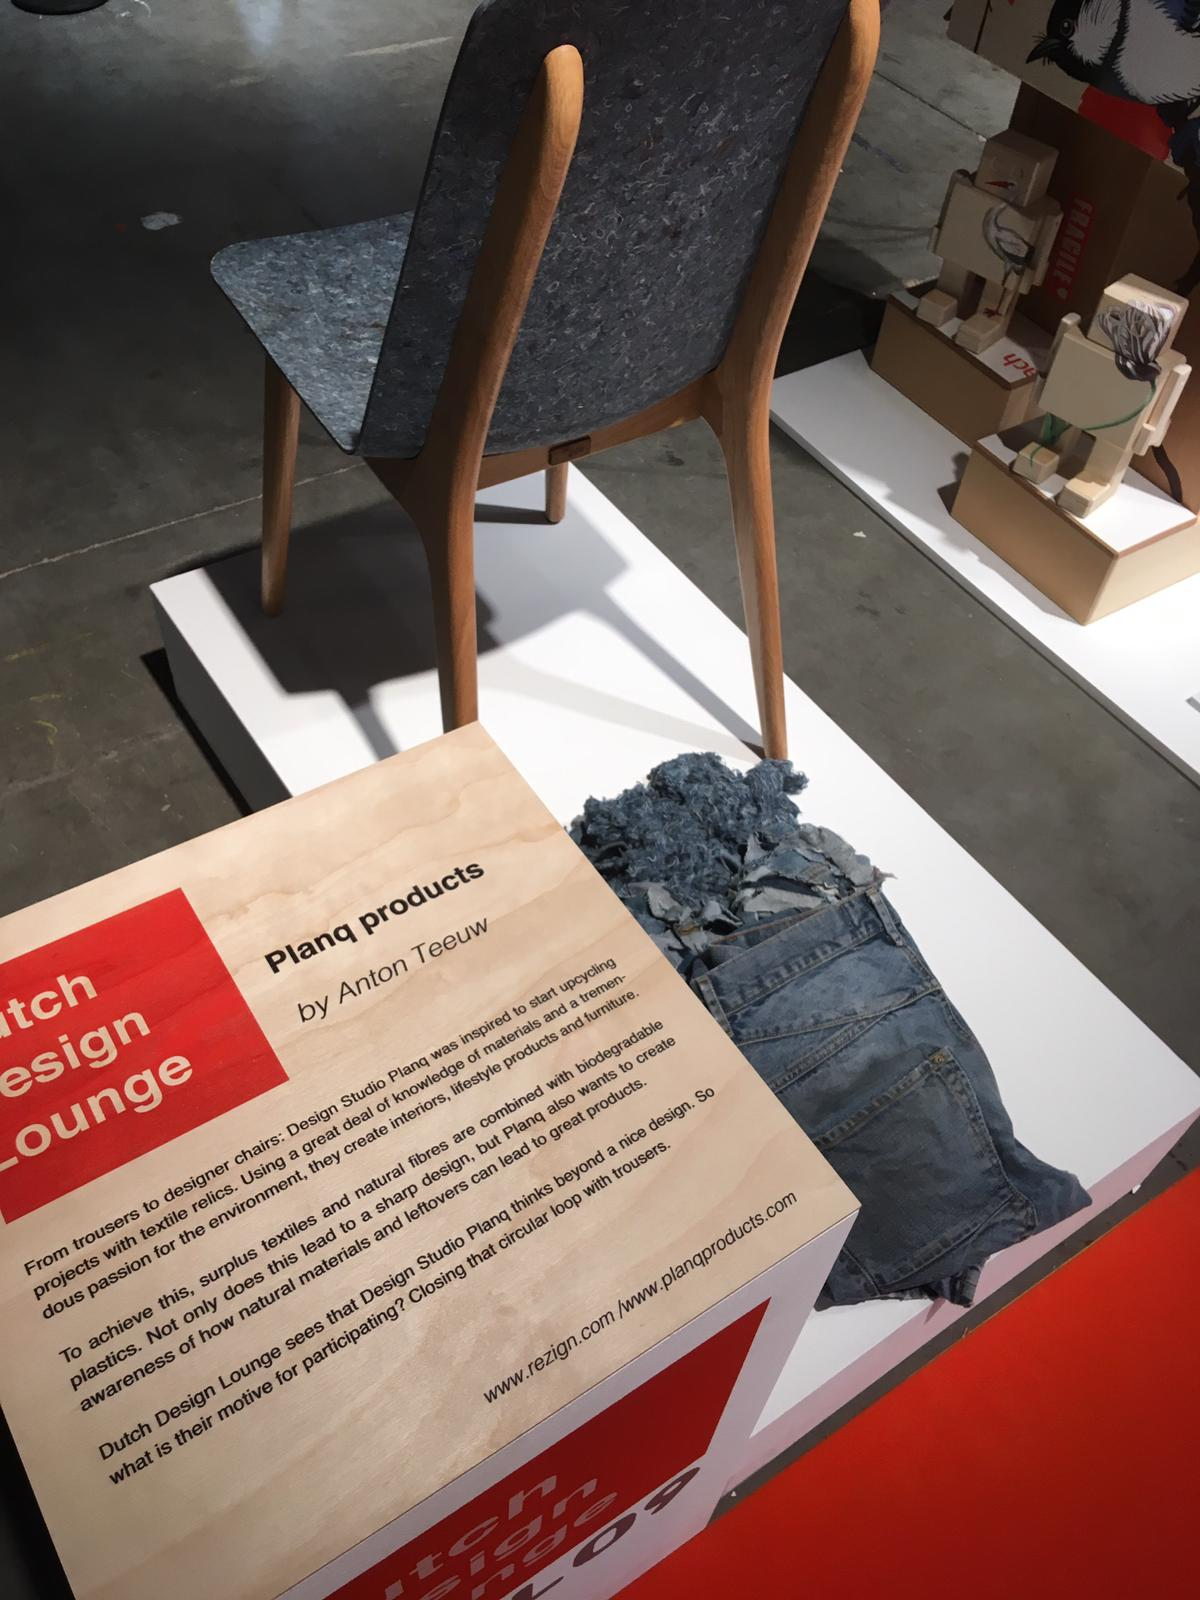 Spijkerbroeken_Duurzaam_Biennale_Interieur_Dutch_Design.jpeg